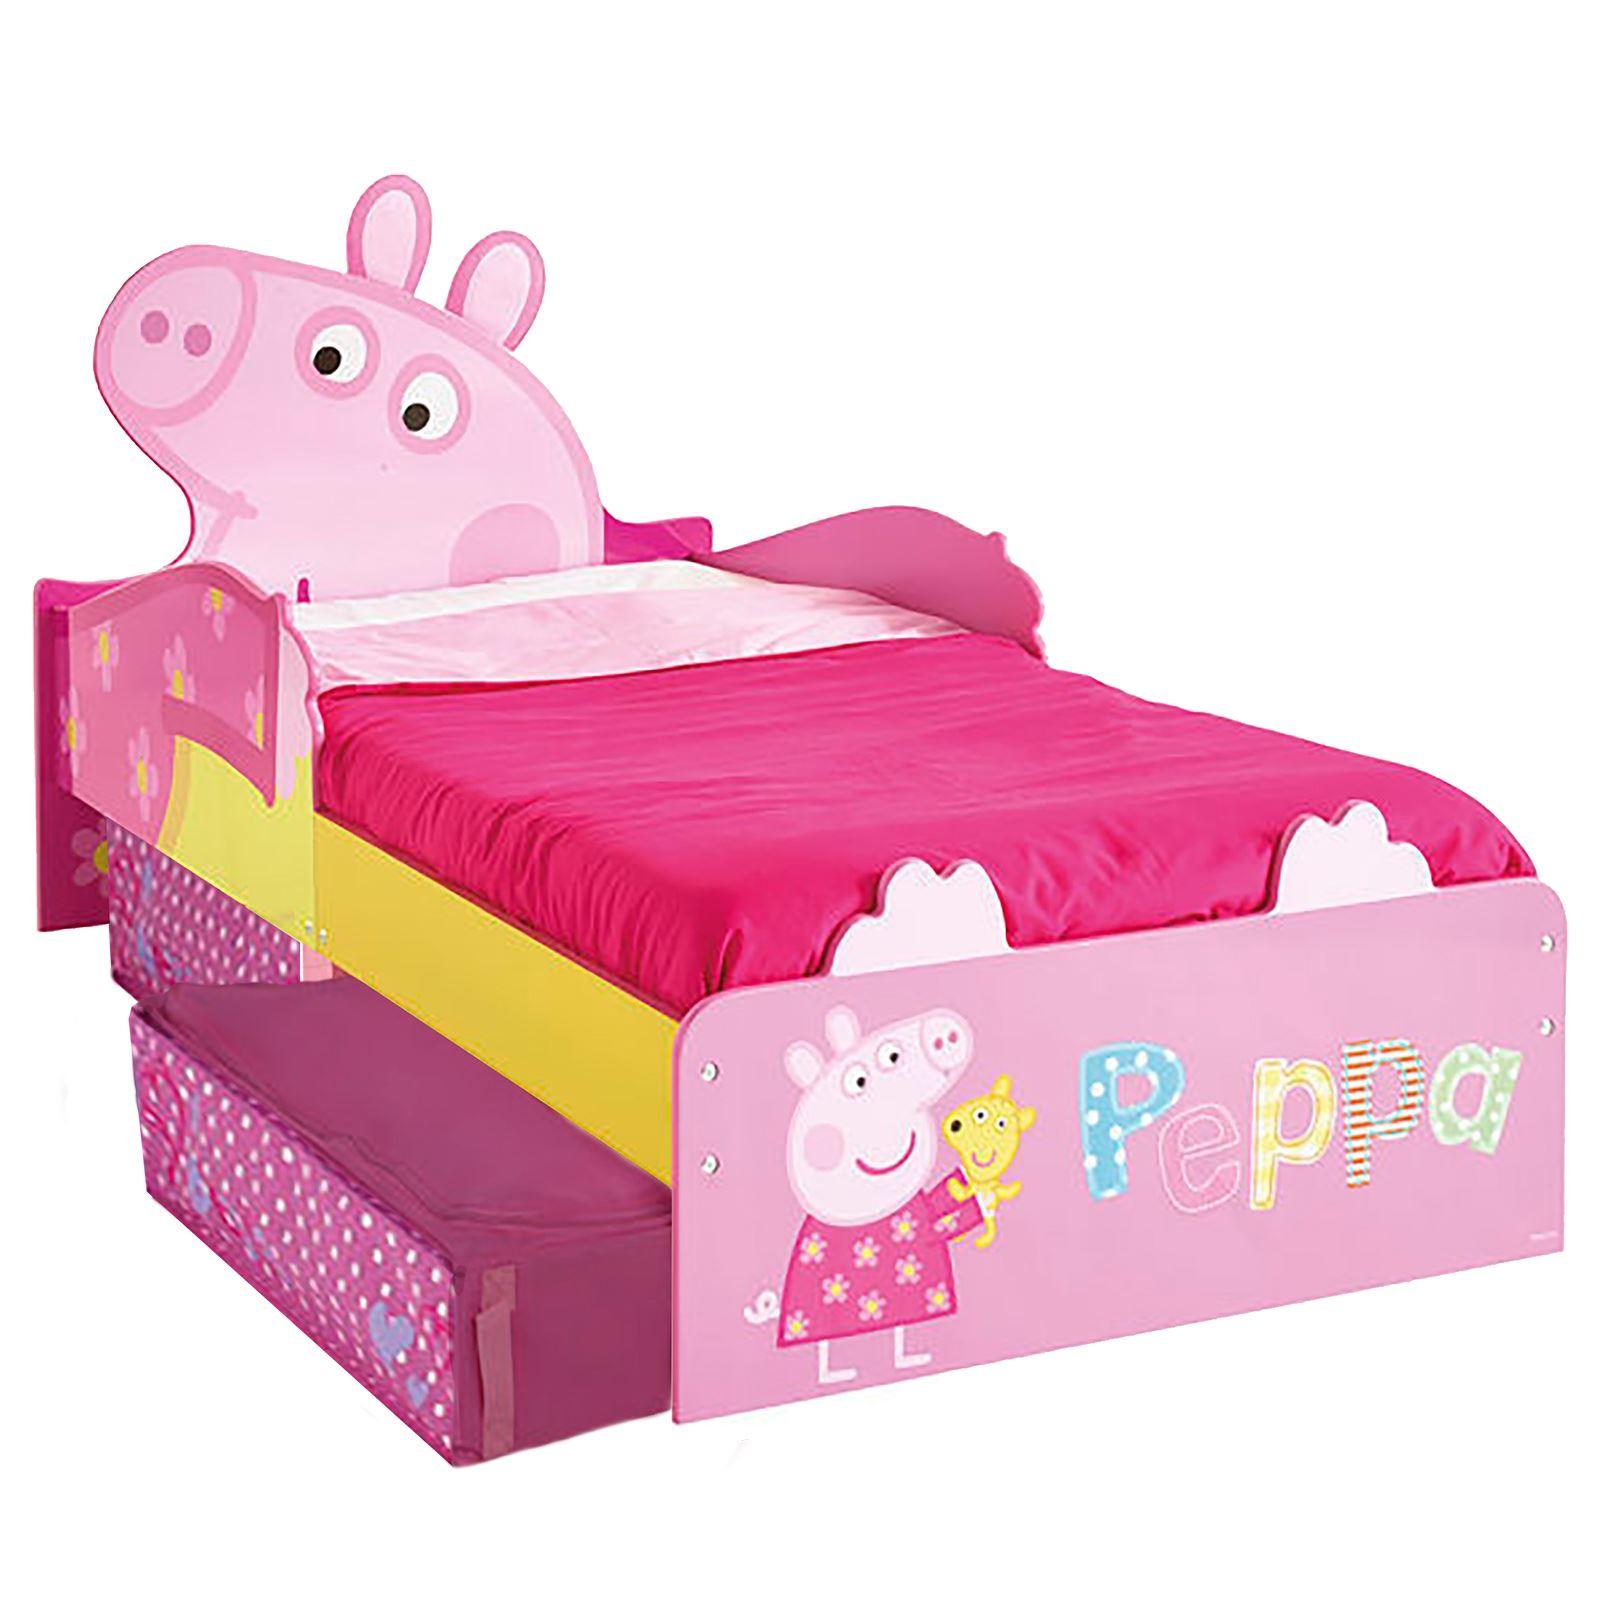 disney lit enfant b b avec rangement matelas cars. Black Bedroom Furniture Sets. Home Design Ideas